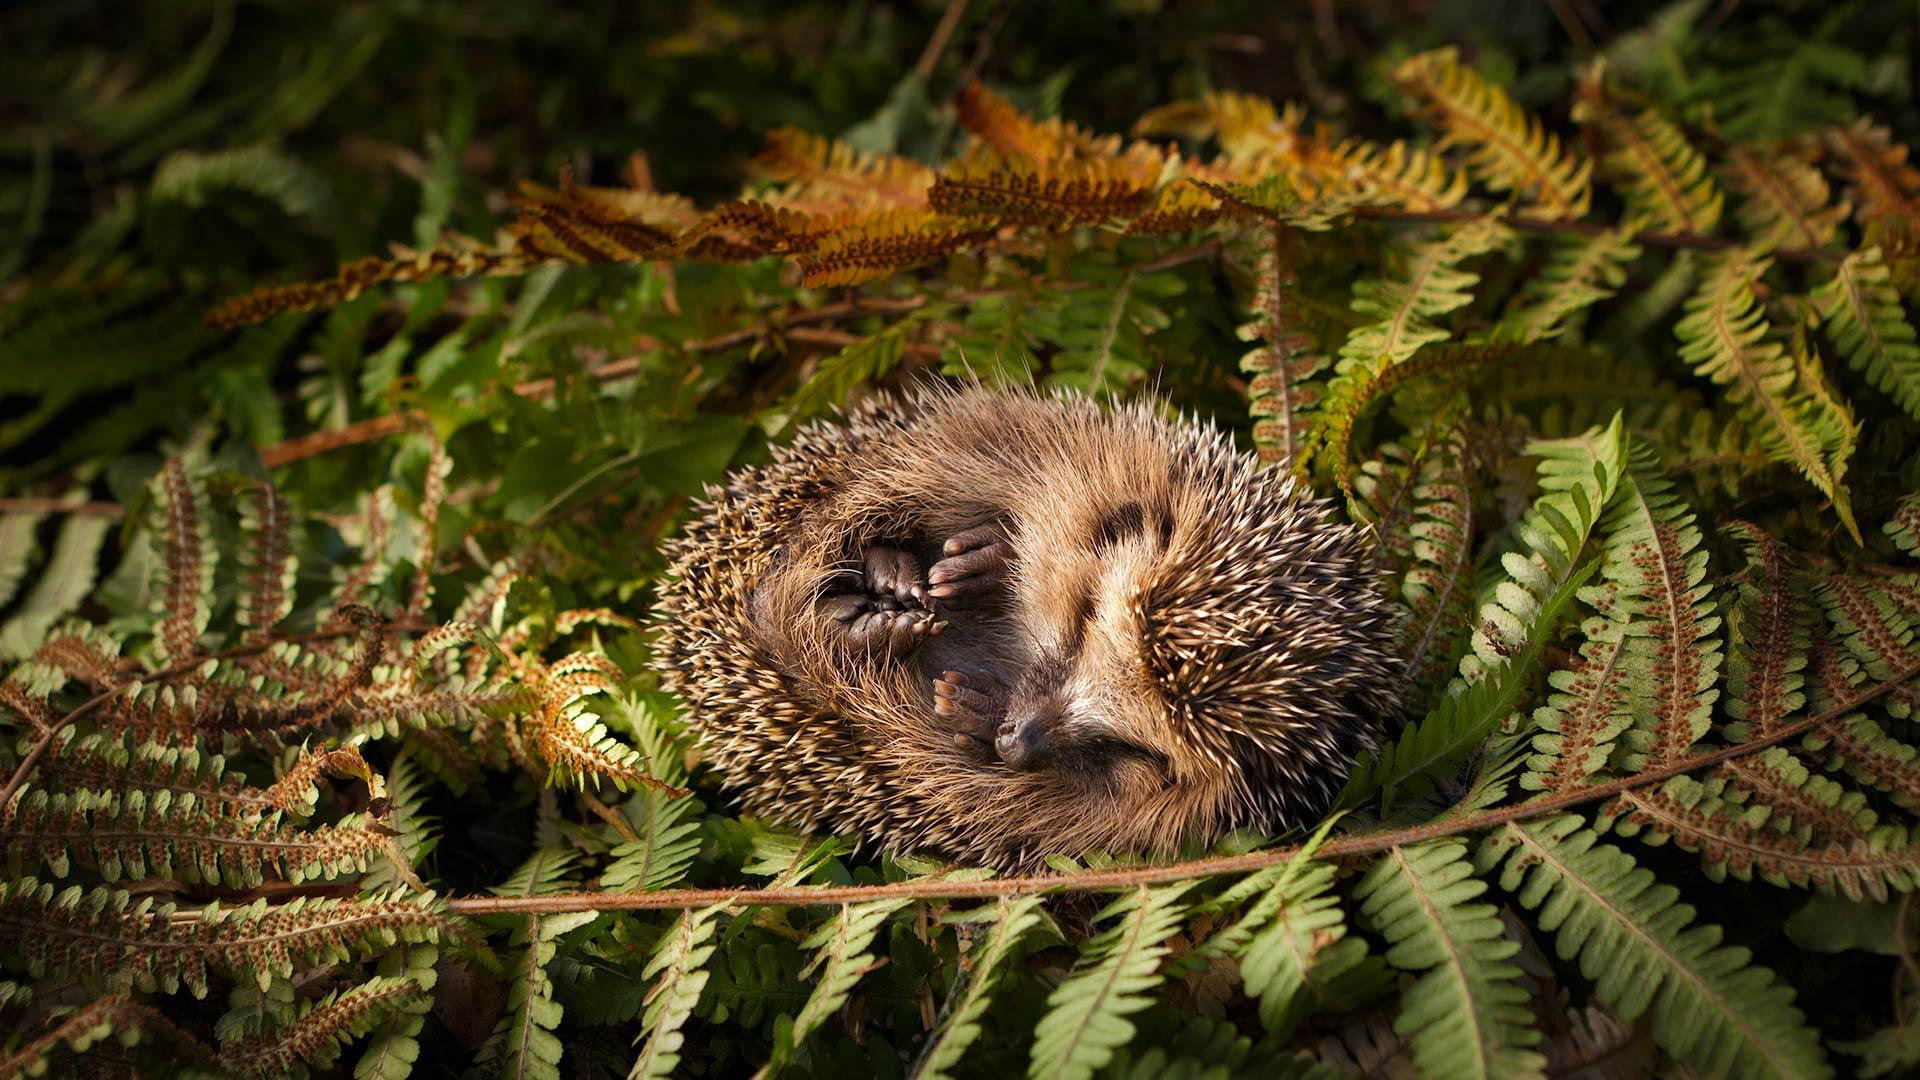 Baby hedgehog (© lorenzo104/Getty Images)(Bing United States)